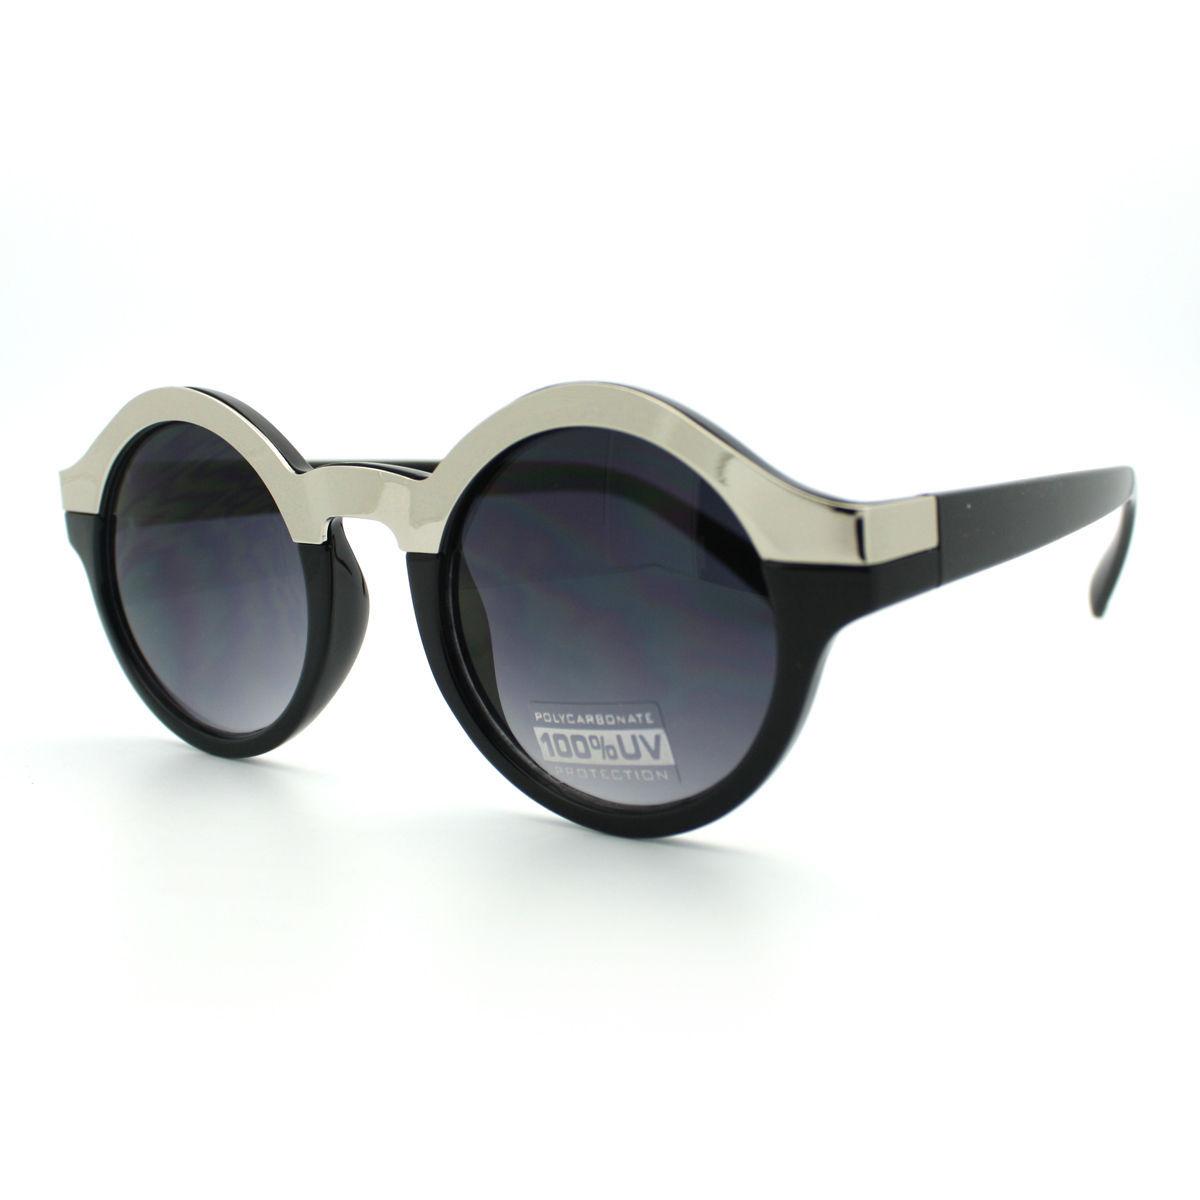 Unique Round Sunglasses Womens Fashion Metallic Top Circle Frame